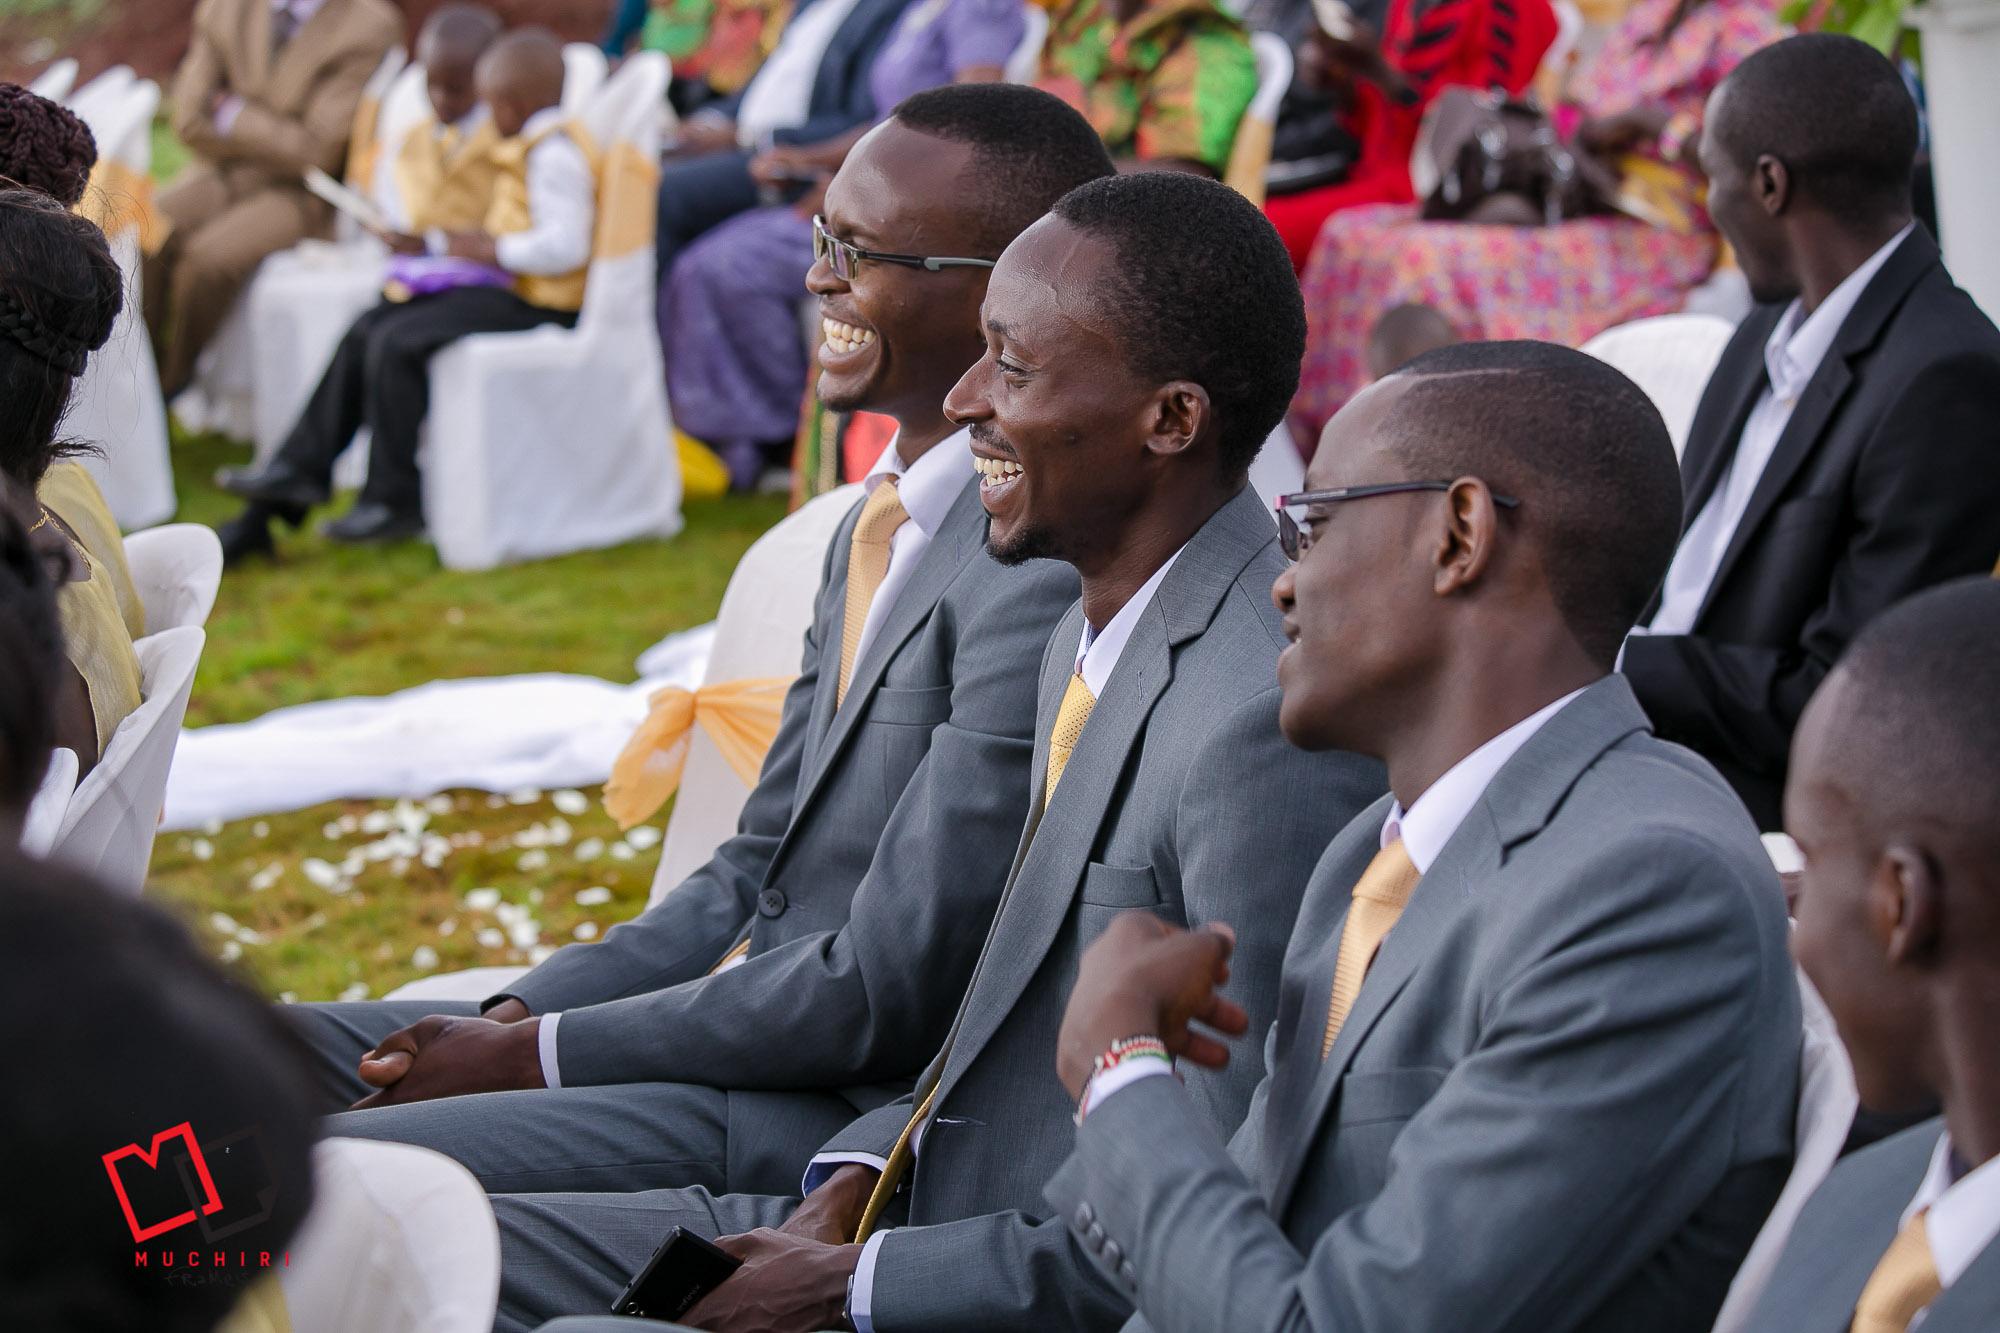 Wedding photographers in Kenya